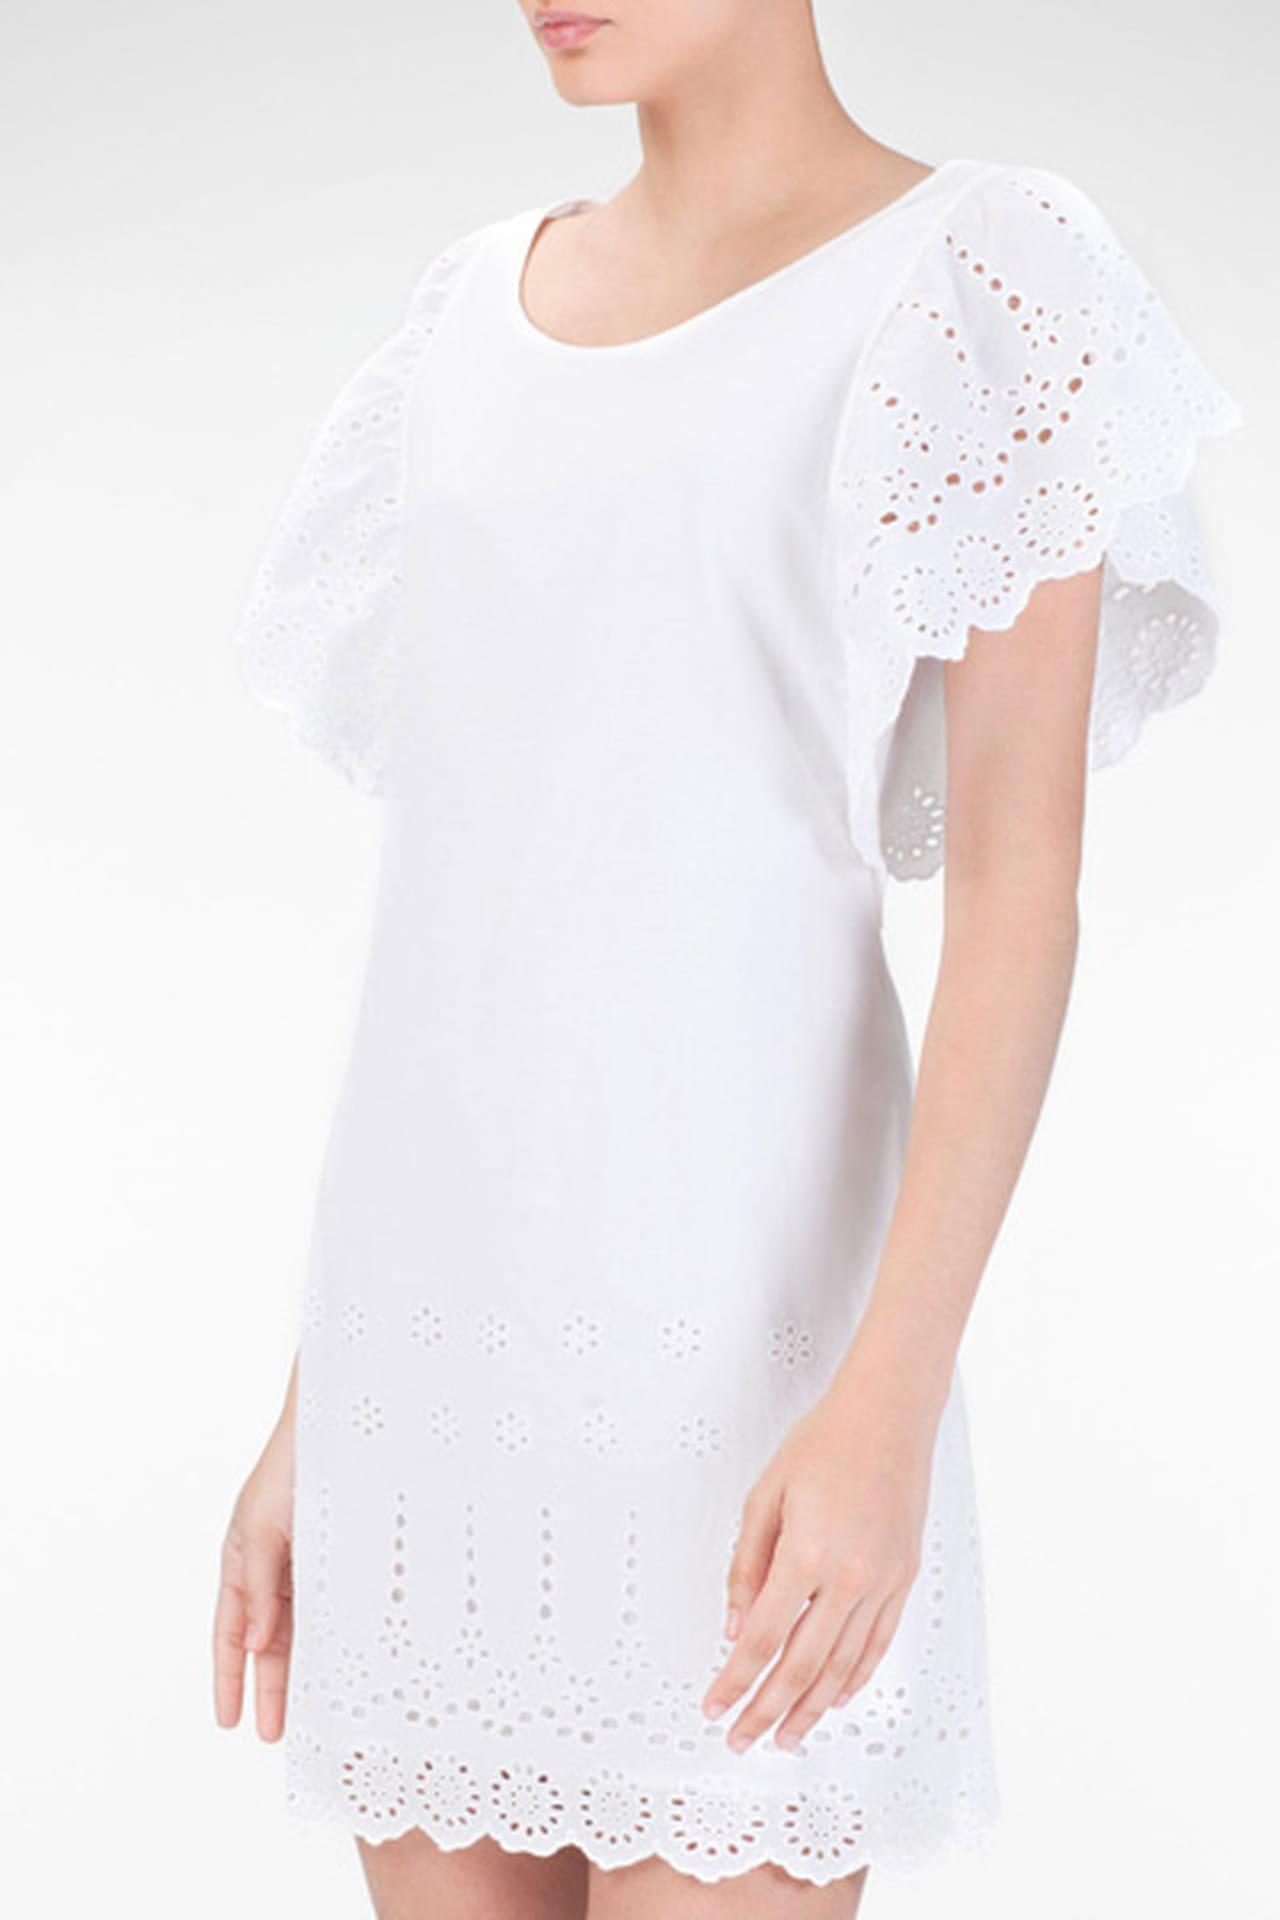 0184934a71874 فستان أبيض بأكمام عريضة من Stradivarius. فستان أبيض من Stradivarius. من موضة  صيف 2013